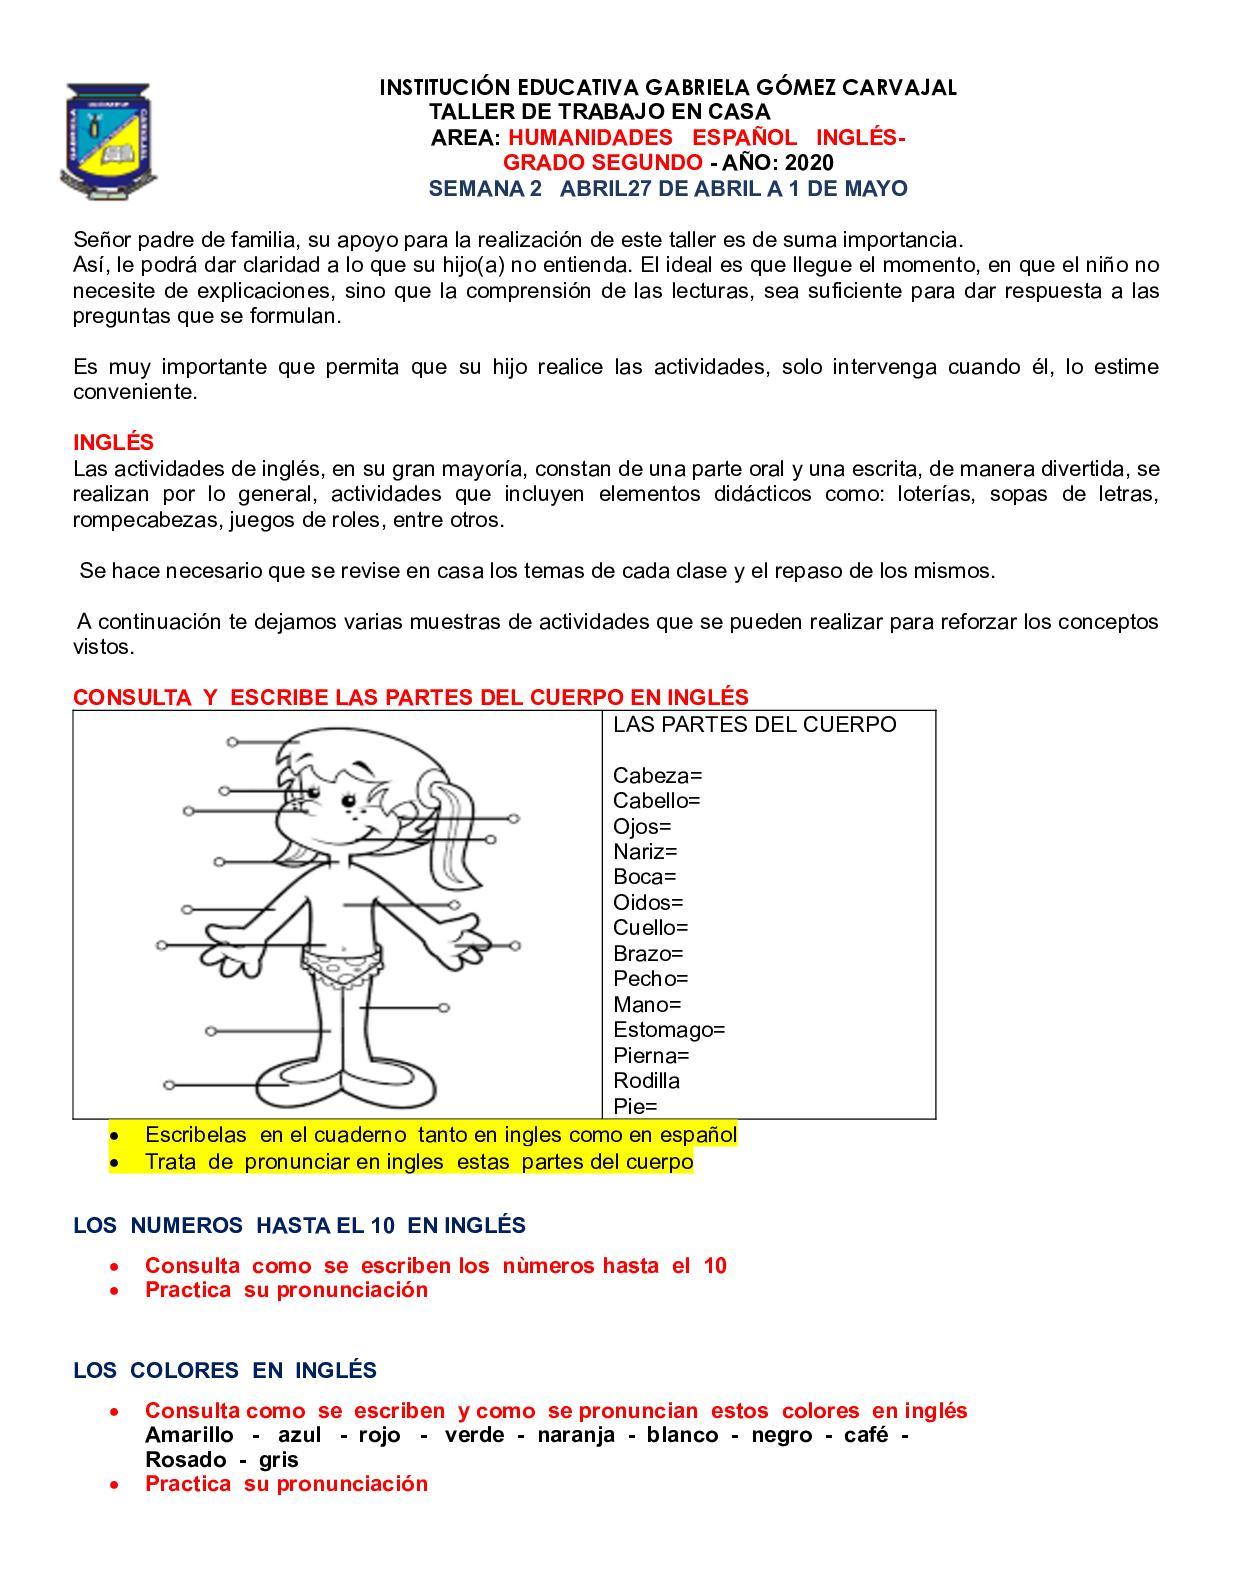 Calameo Ingles Espanol 27 Al 1 Mayo